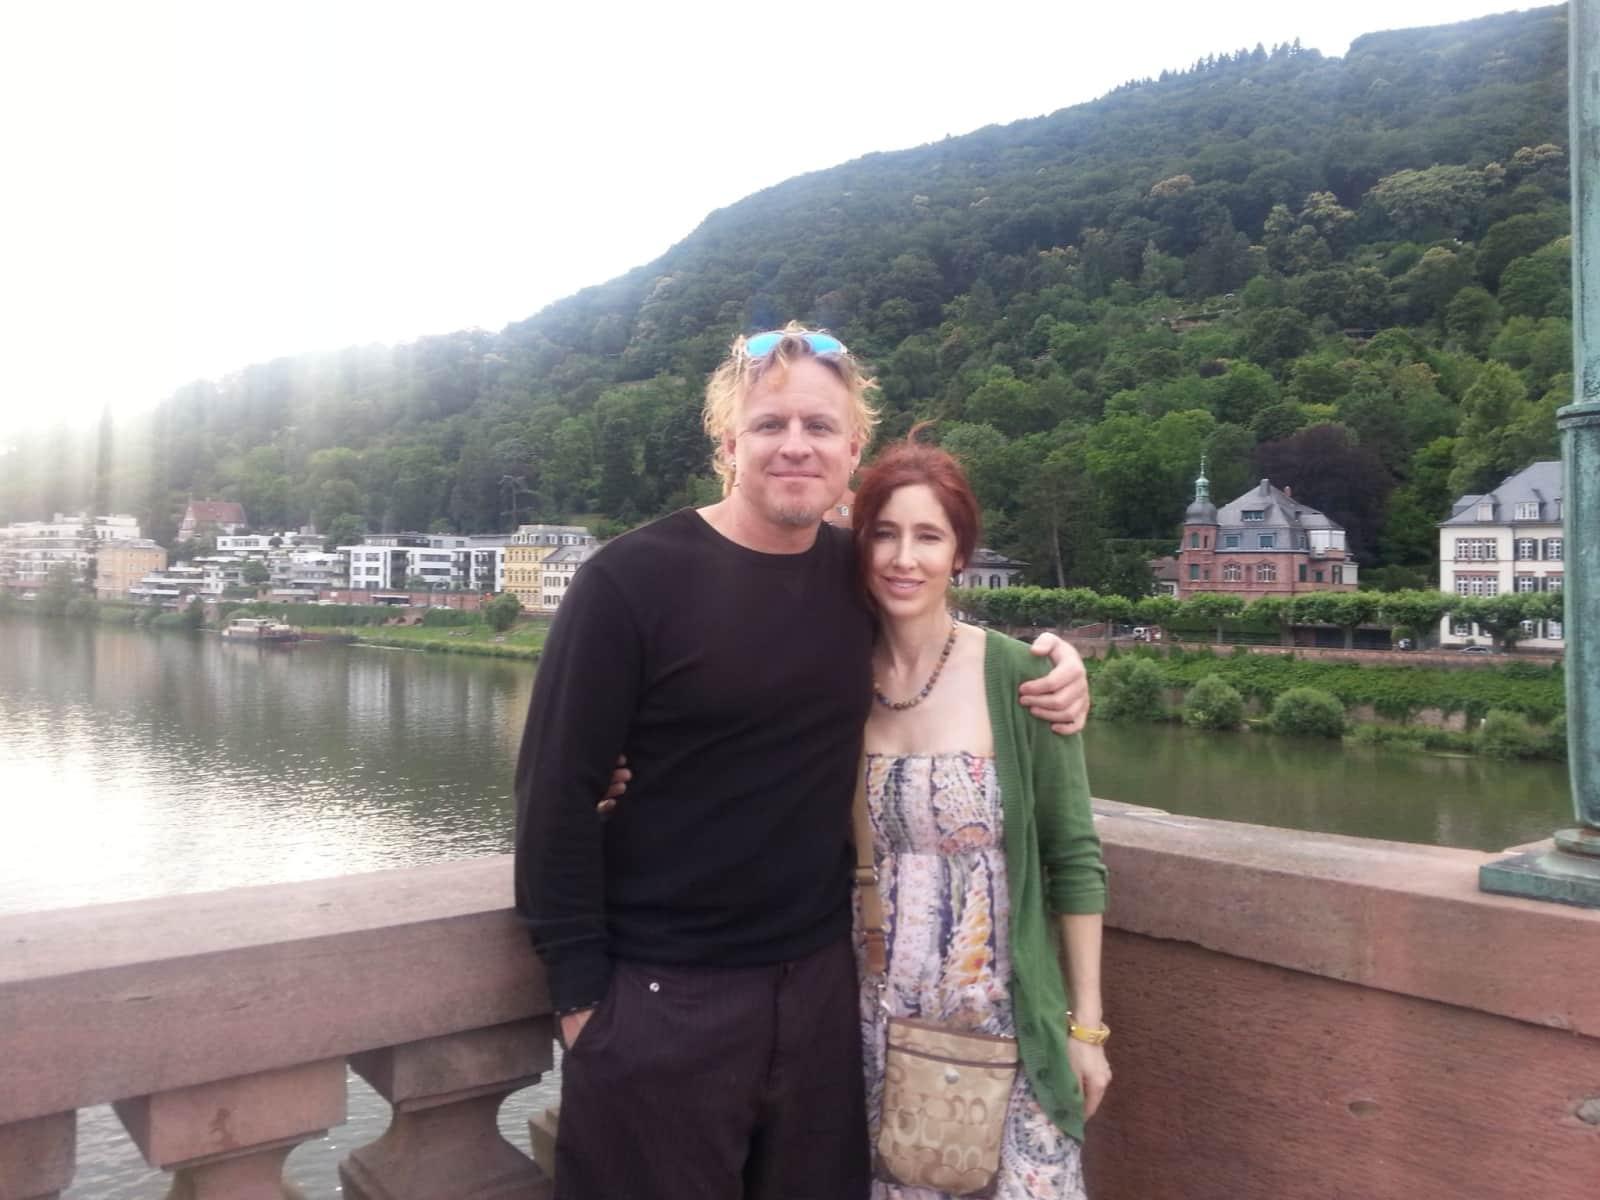 Lori & John-patrick from Dallas Downtown, Texas, United States